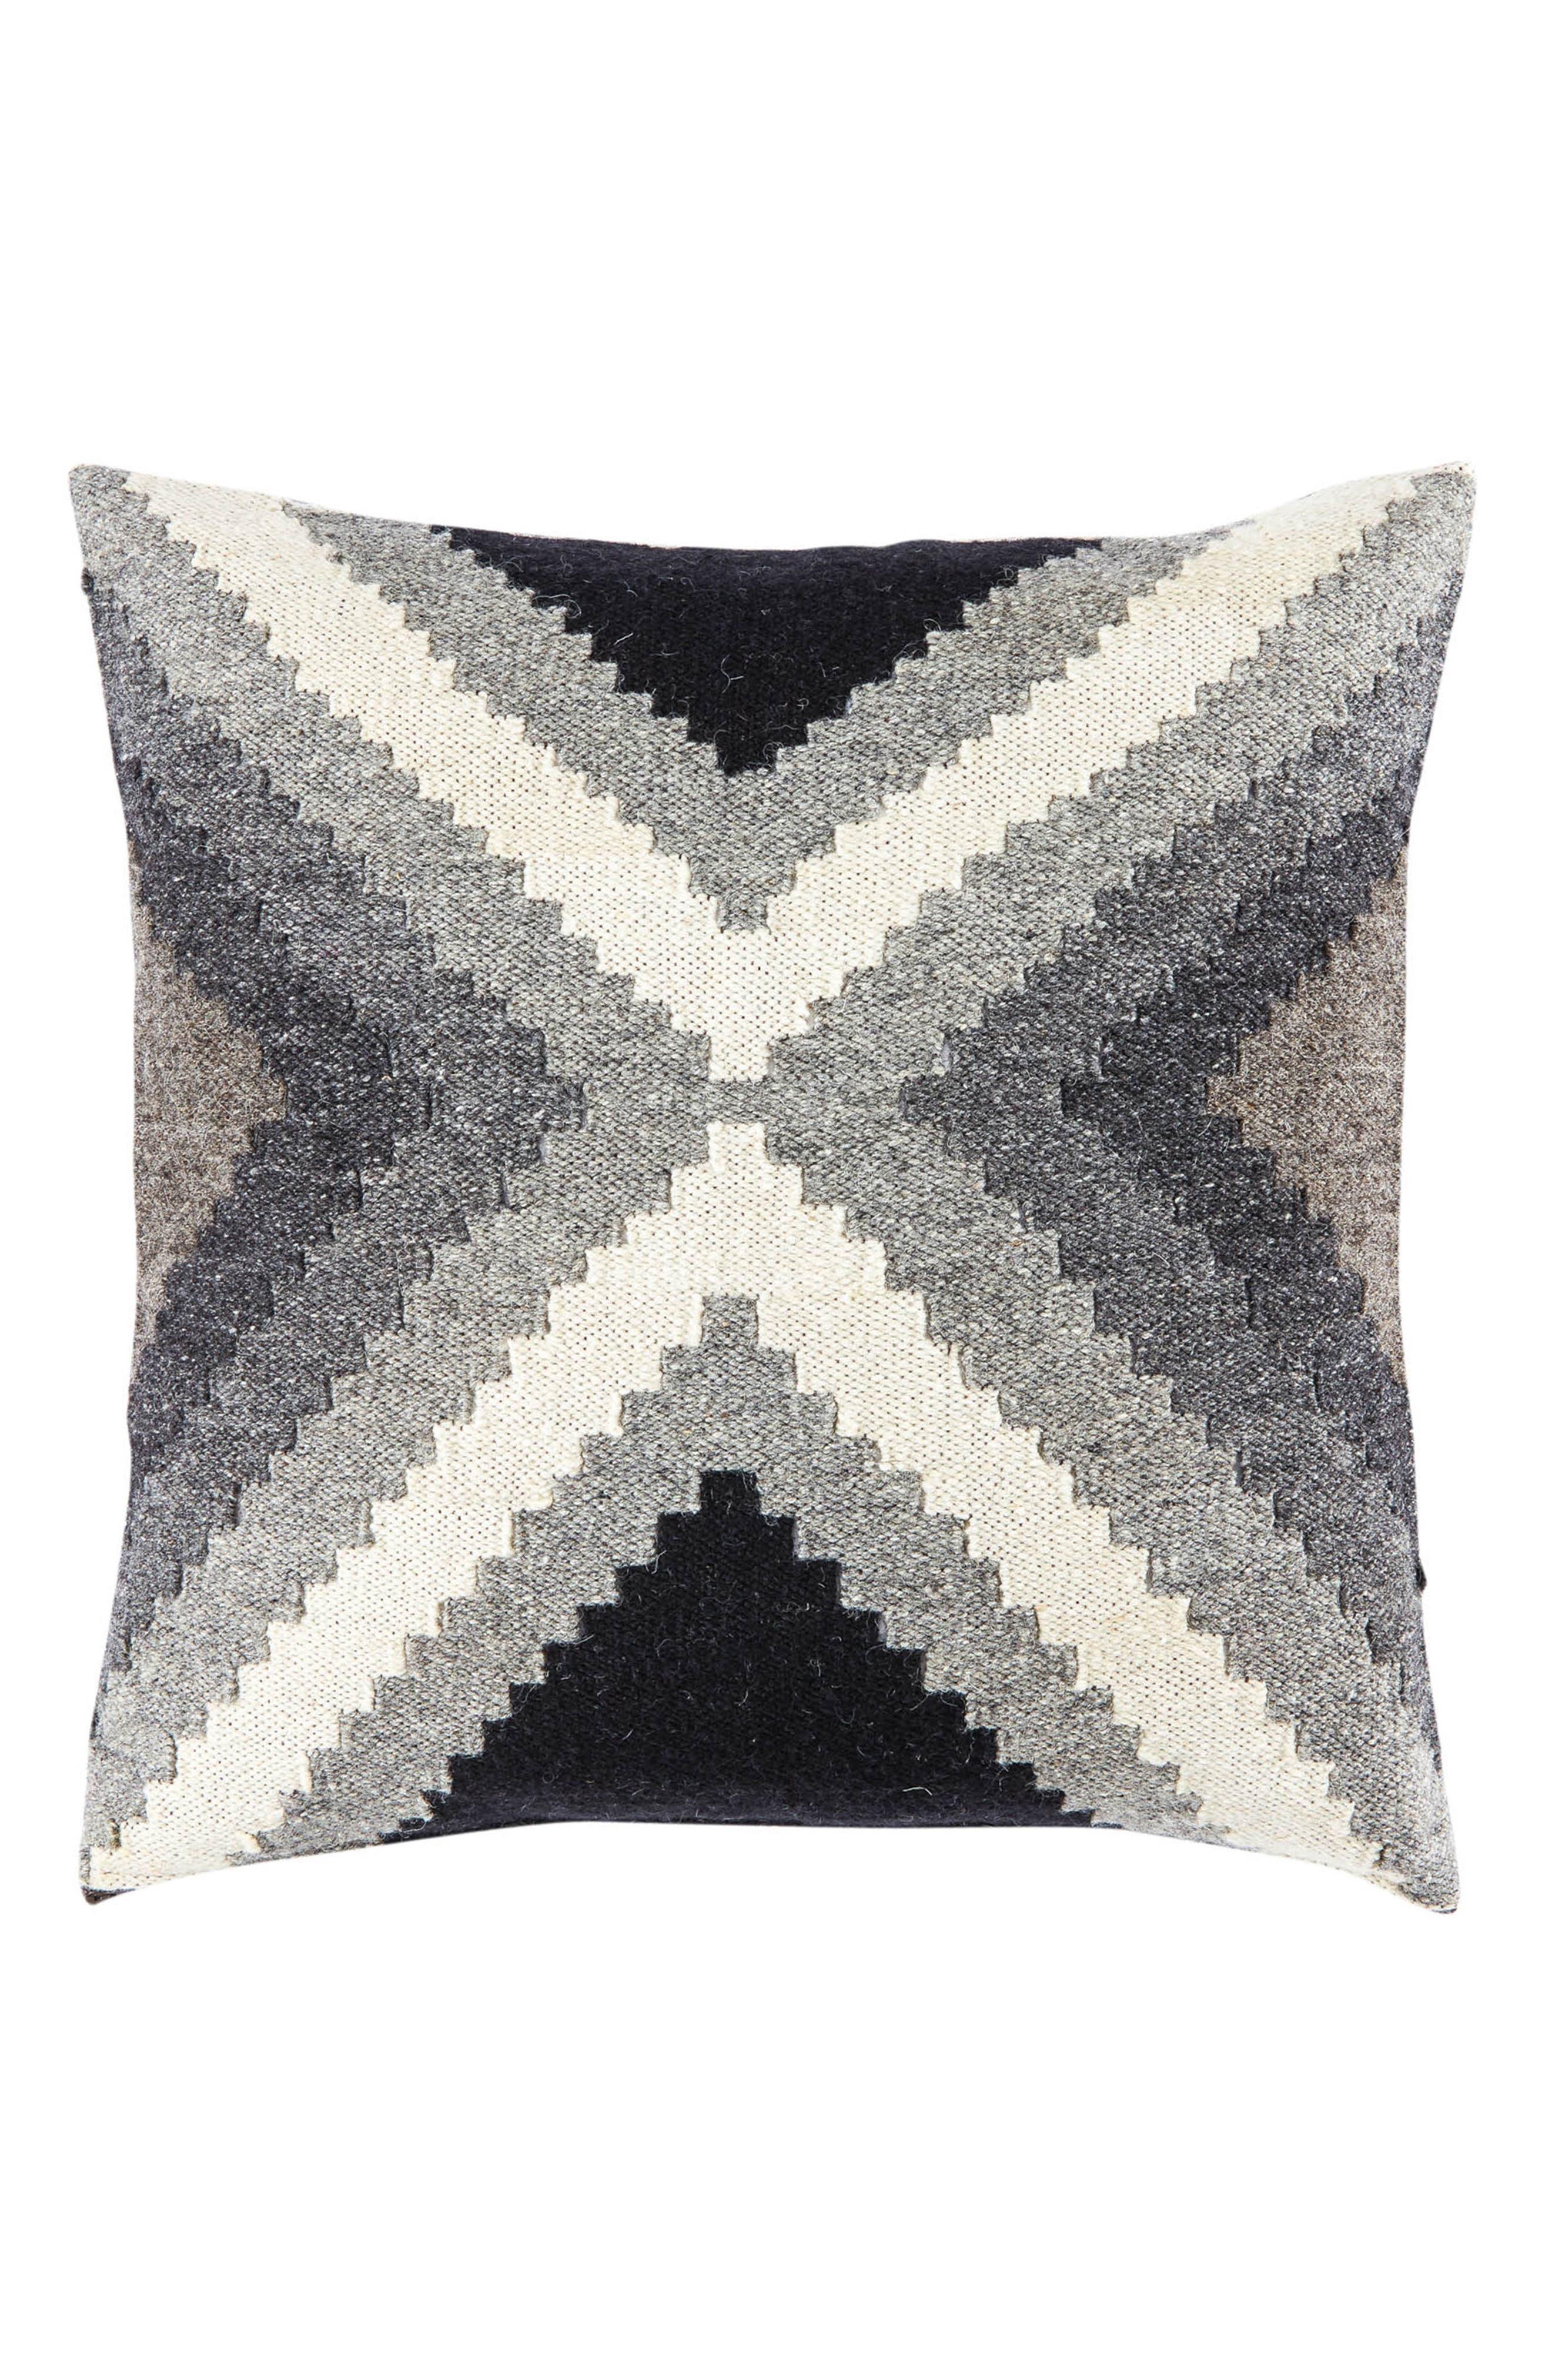 Alternate Image 1 Selected - Jaipur Peykan Pillow